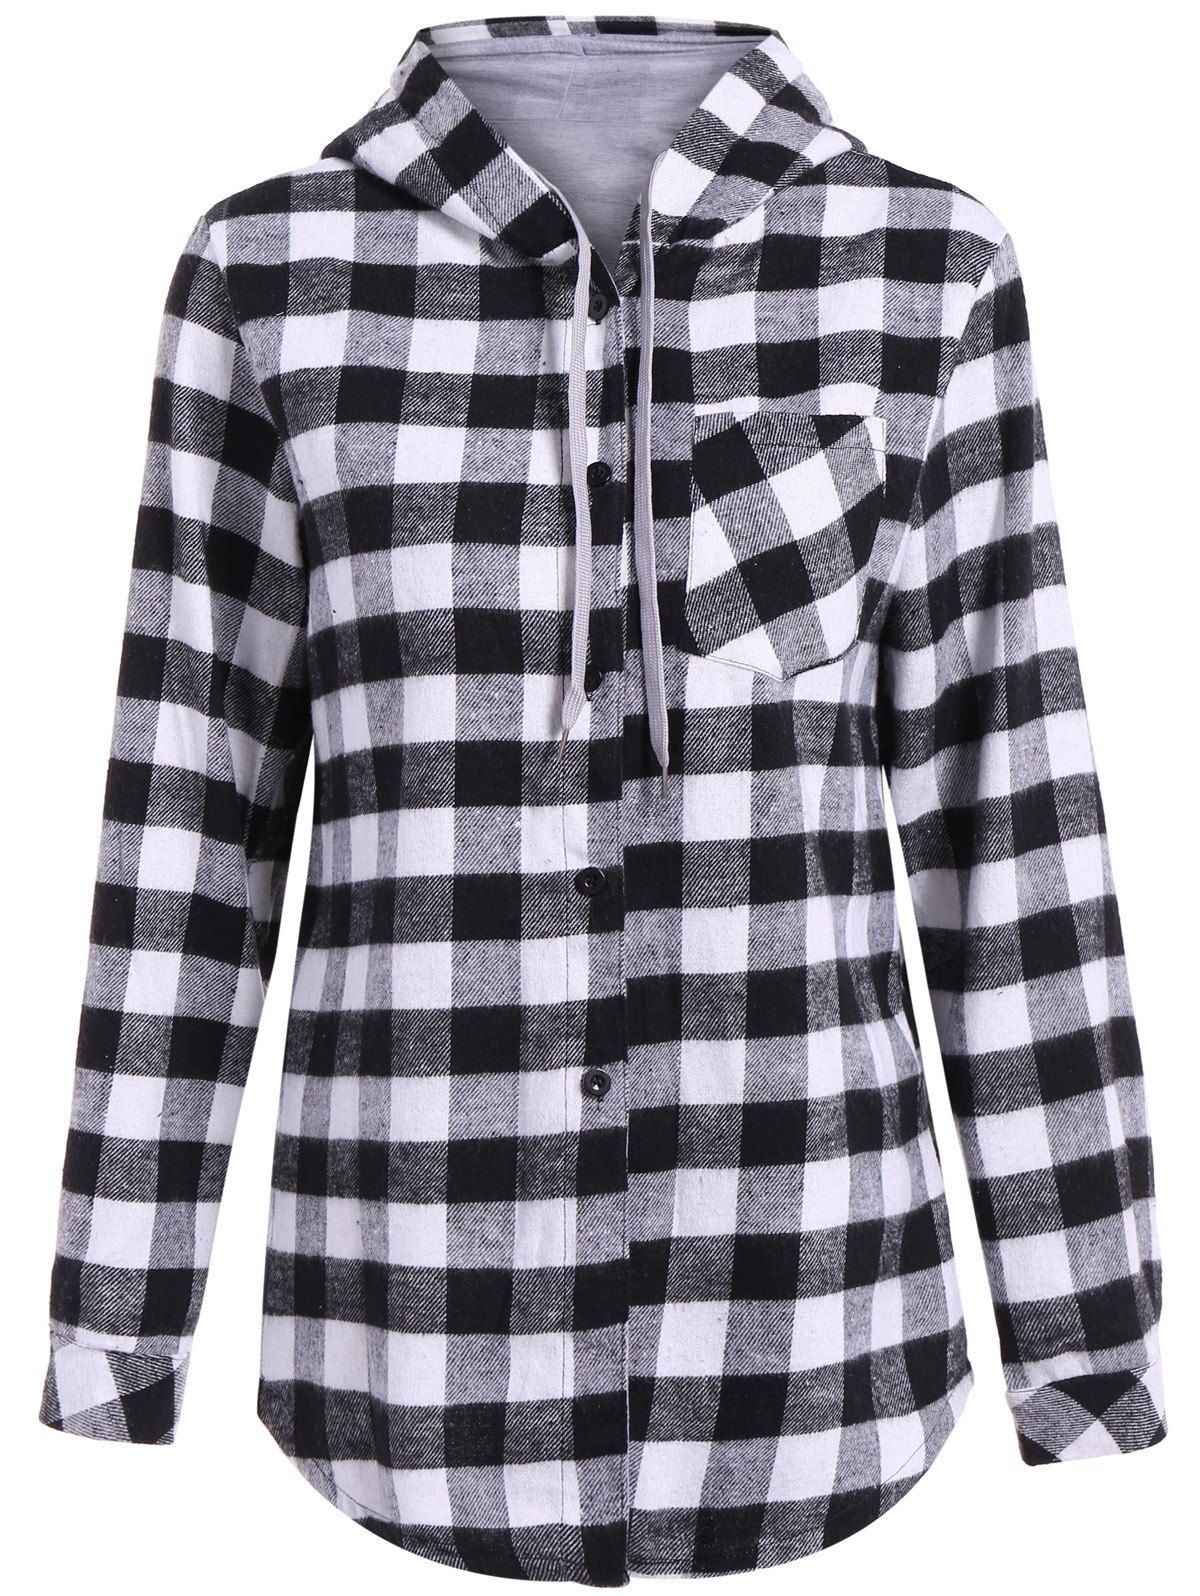 Plus size flannel shirt dress  Hooded Long Sleeve Plaid Shirt  BLOUSES u LONG SLEEVES  Pinterest